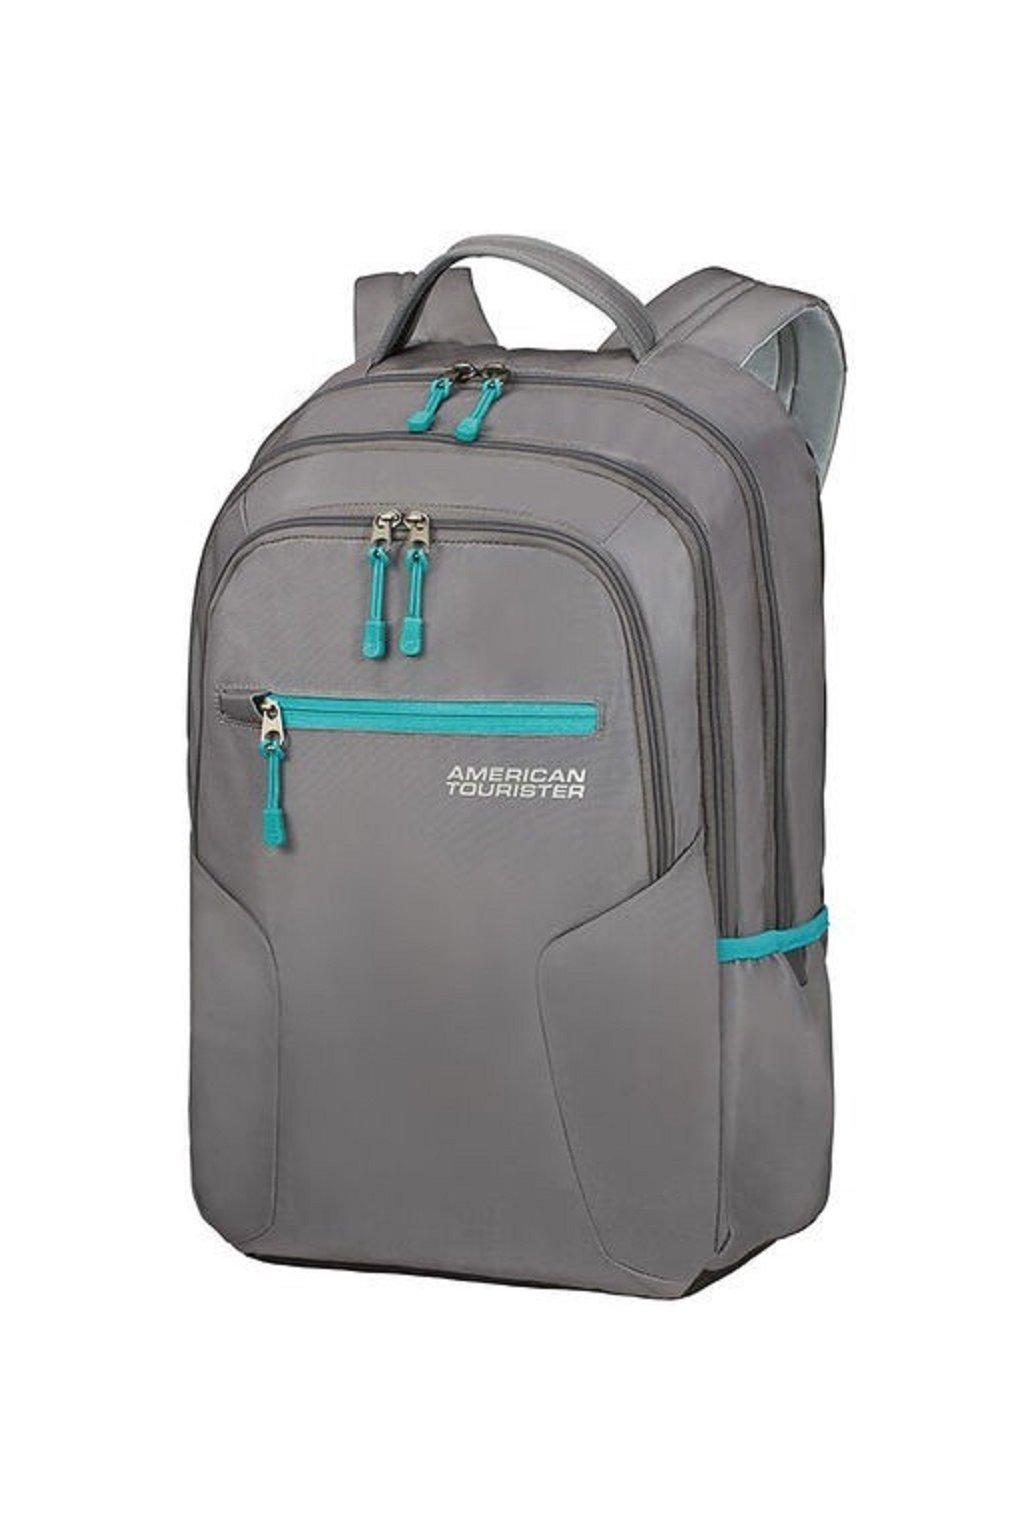 "Urban Groove Laptop Backpack 15.6"" Grey/Green"